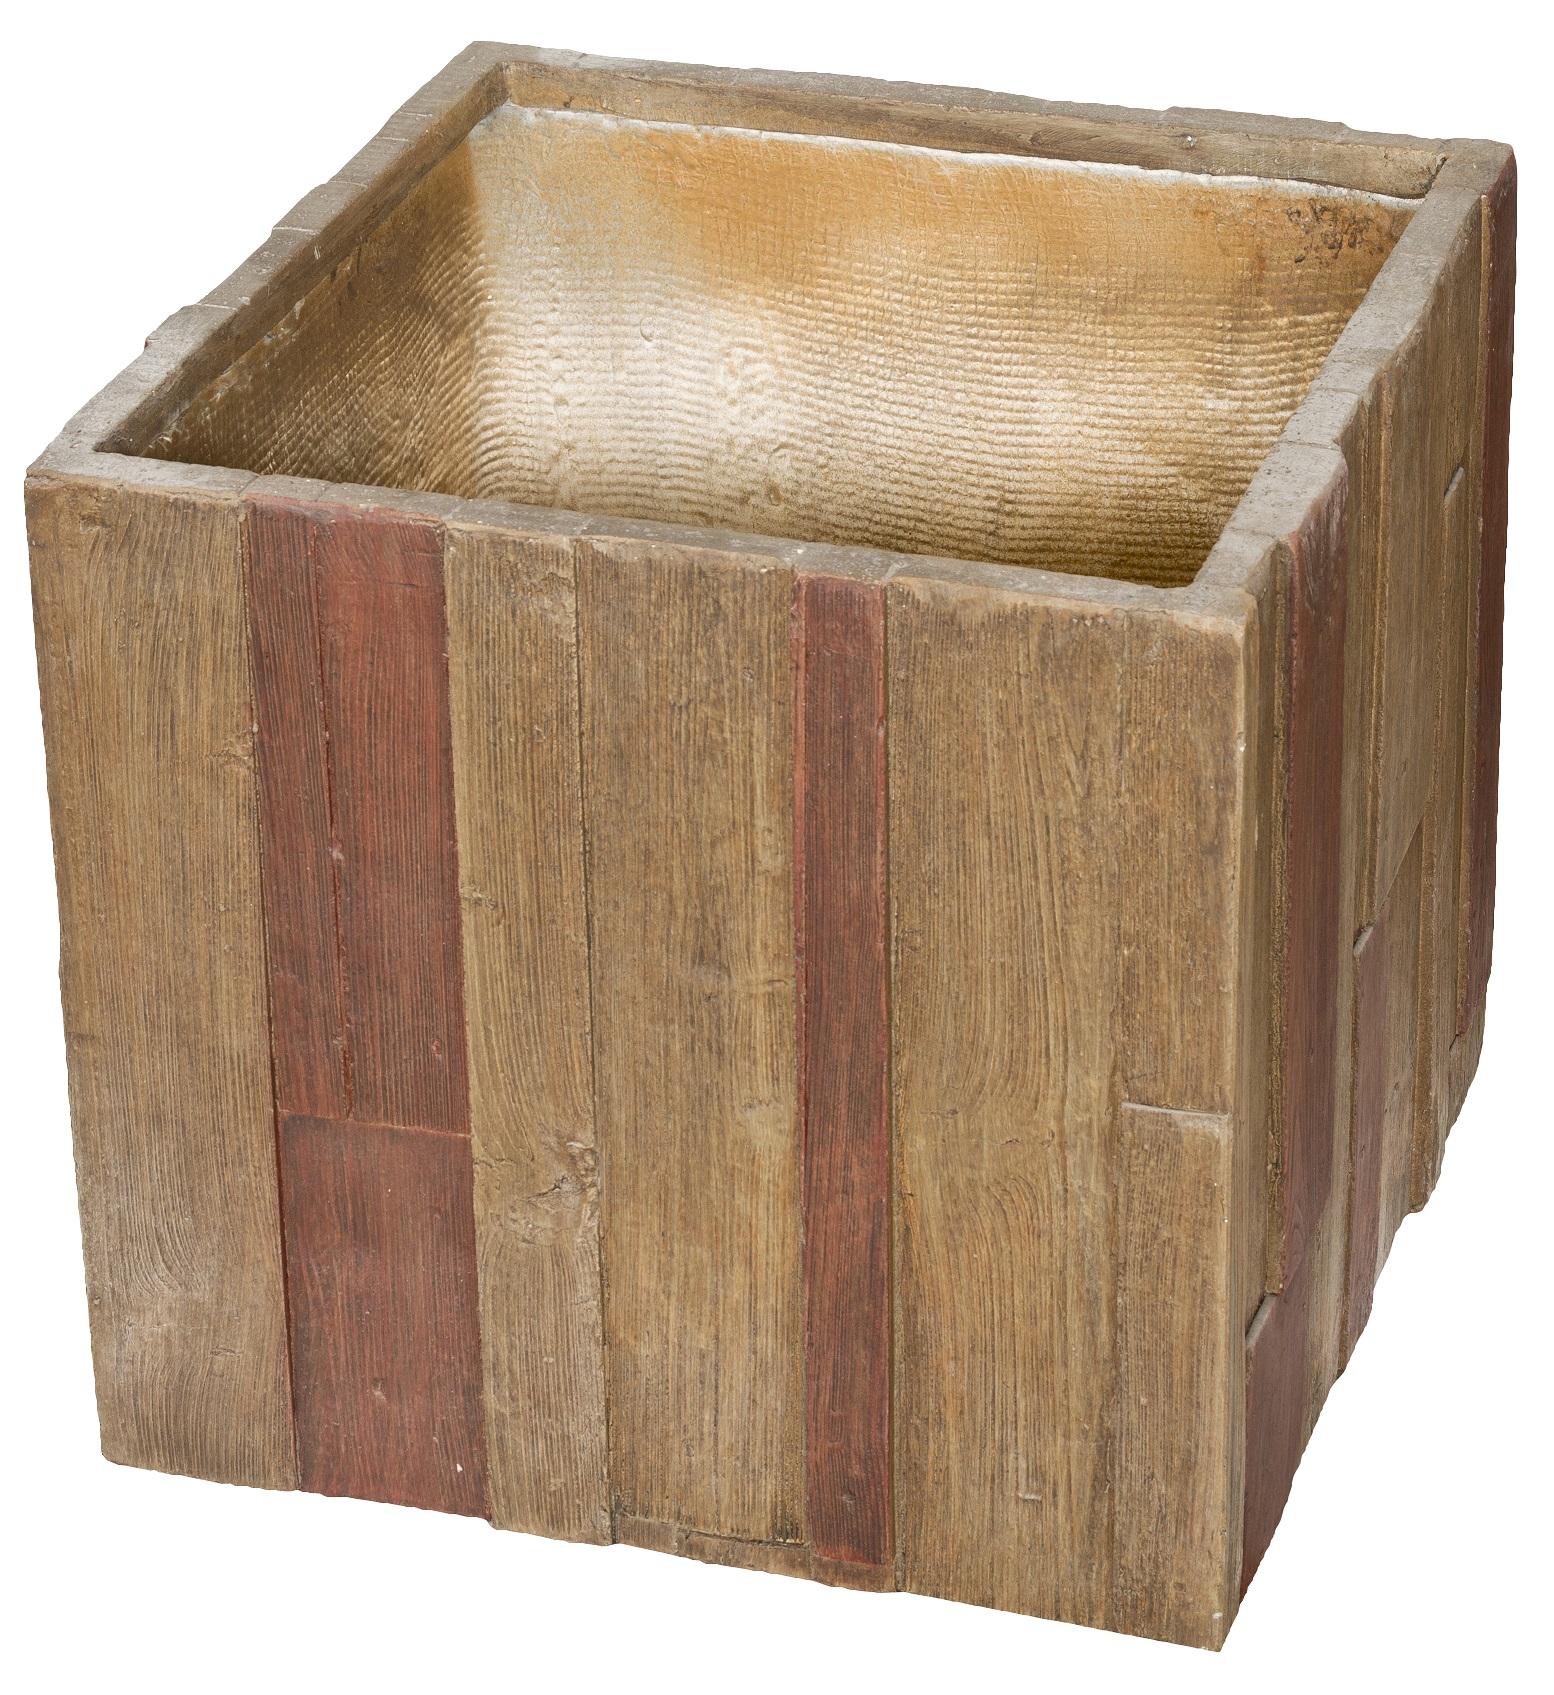 Květináč G21 Wood Cube 55x55x52cm + doprava zdarma